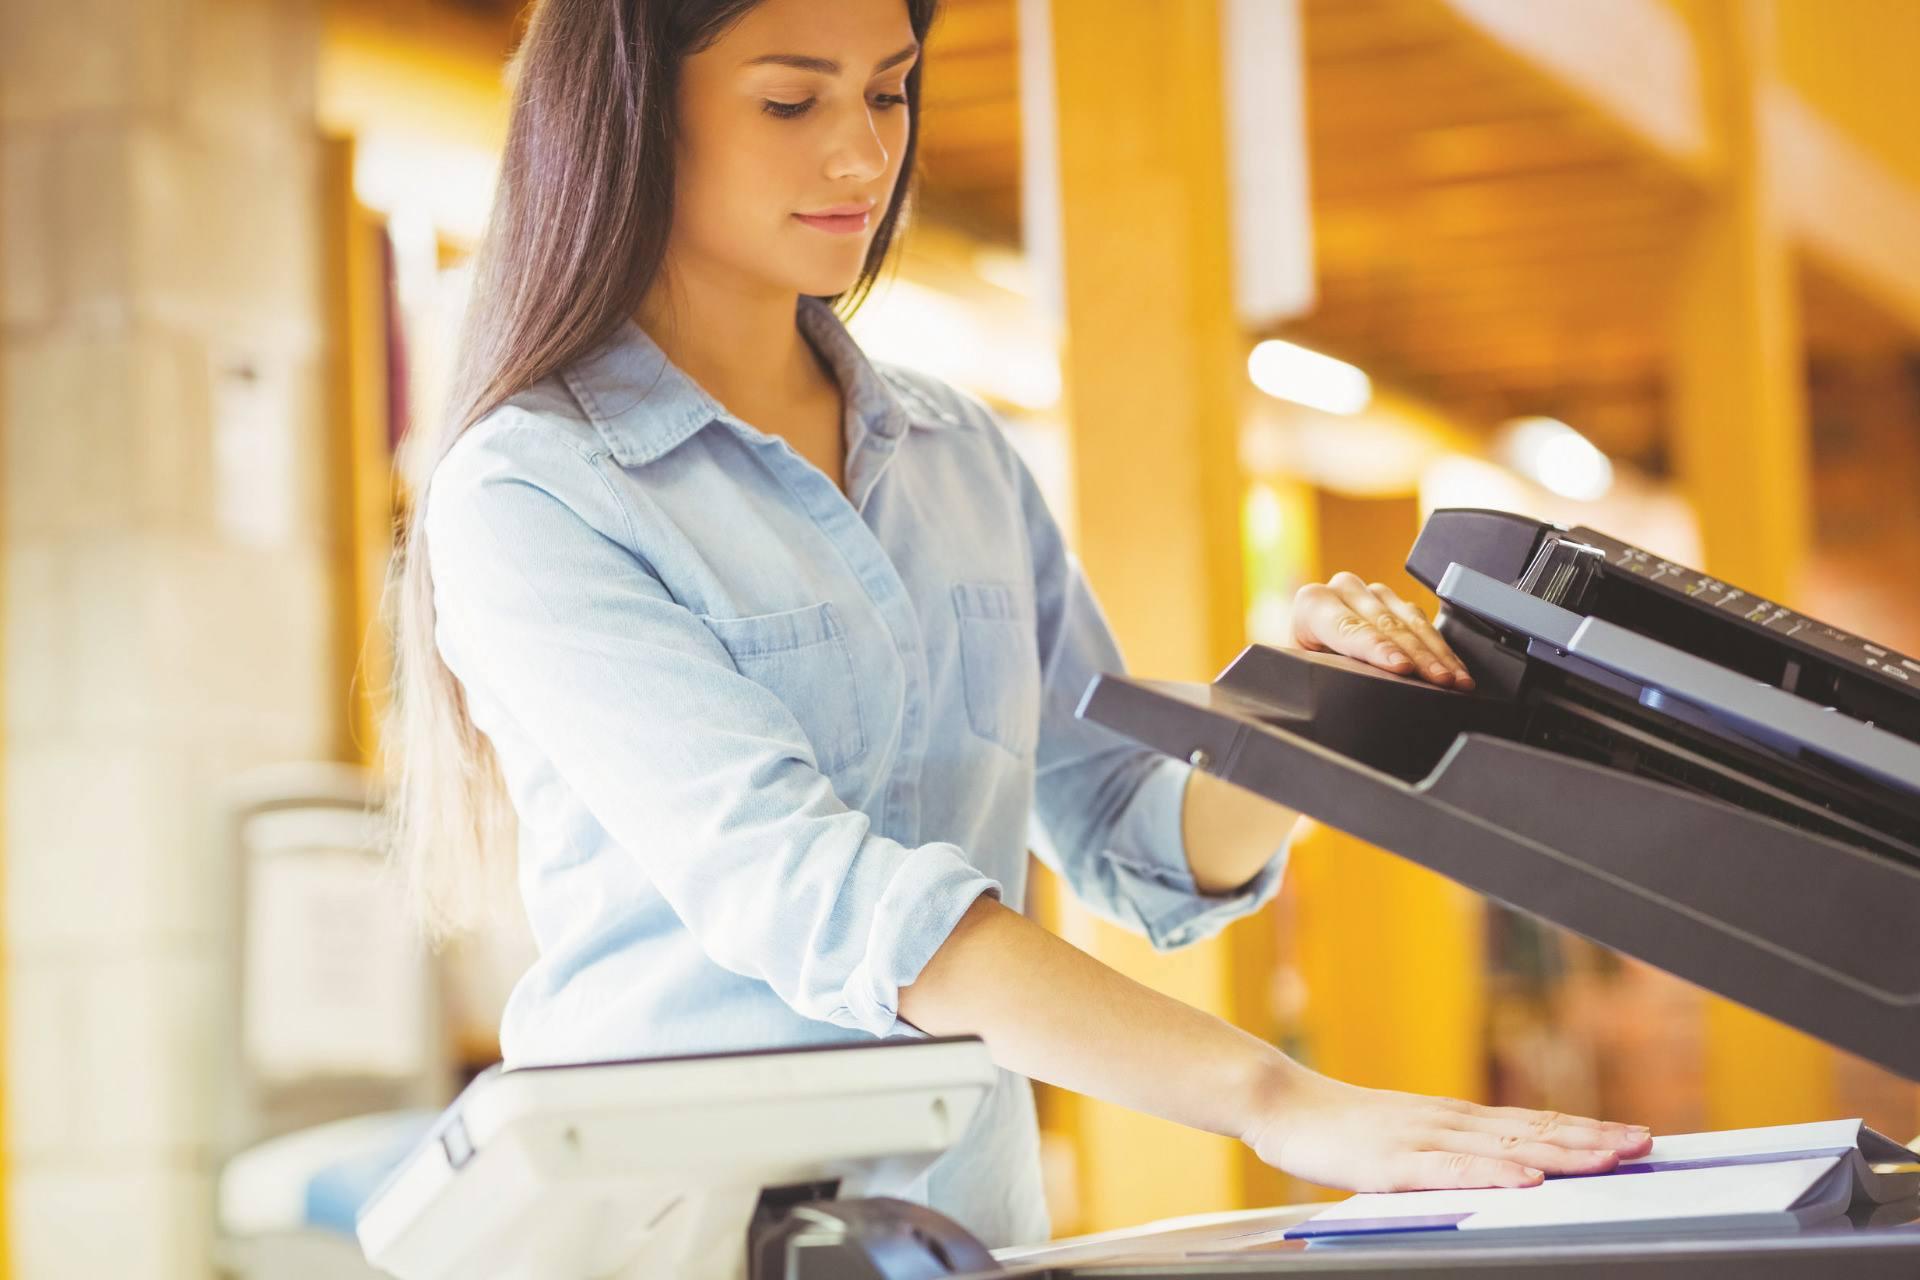 Multifunction Printers Euro Digital Systems